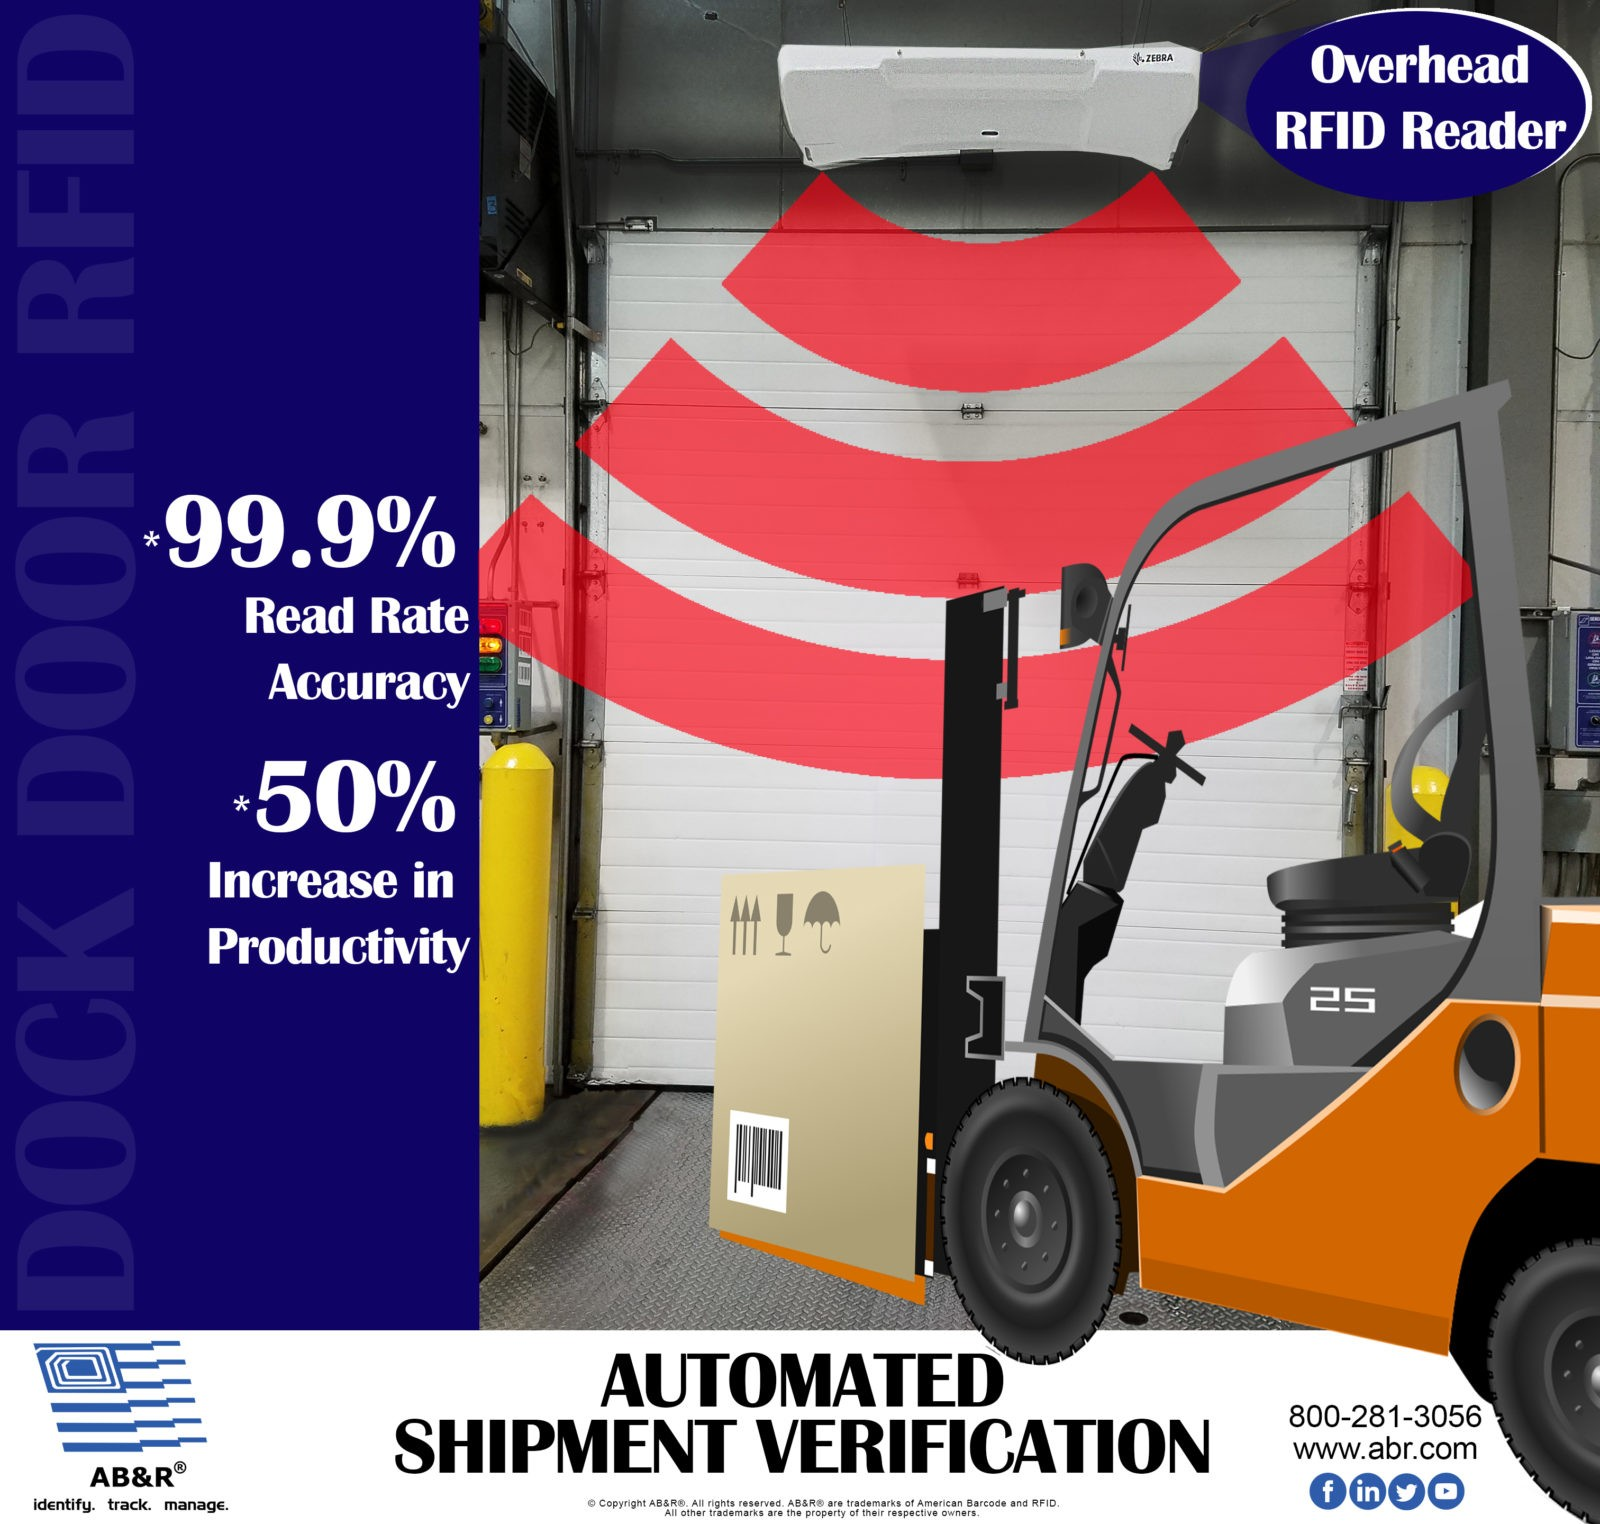 Barcode Verification automated shipment verification - ab&r® (american barcode